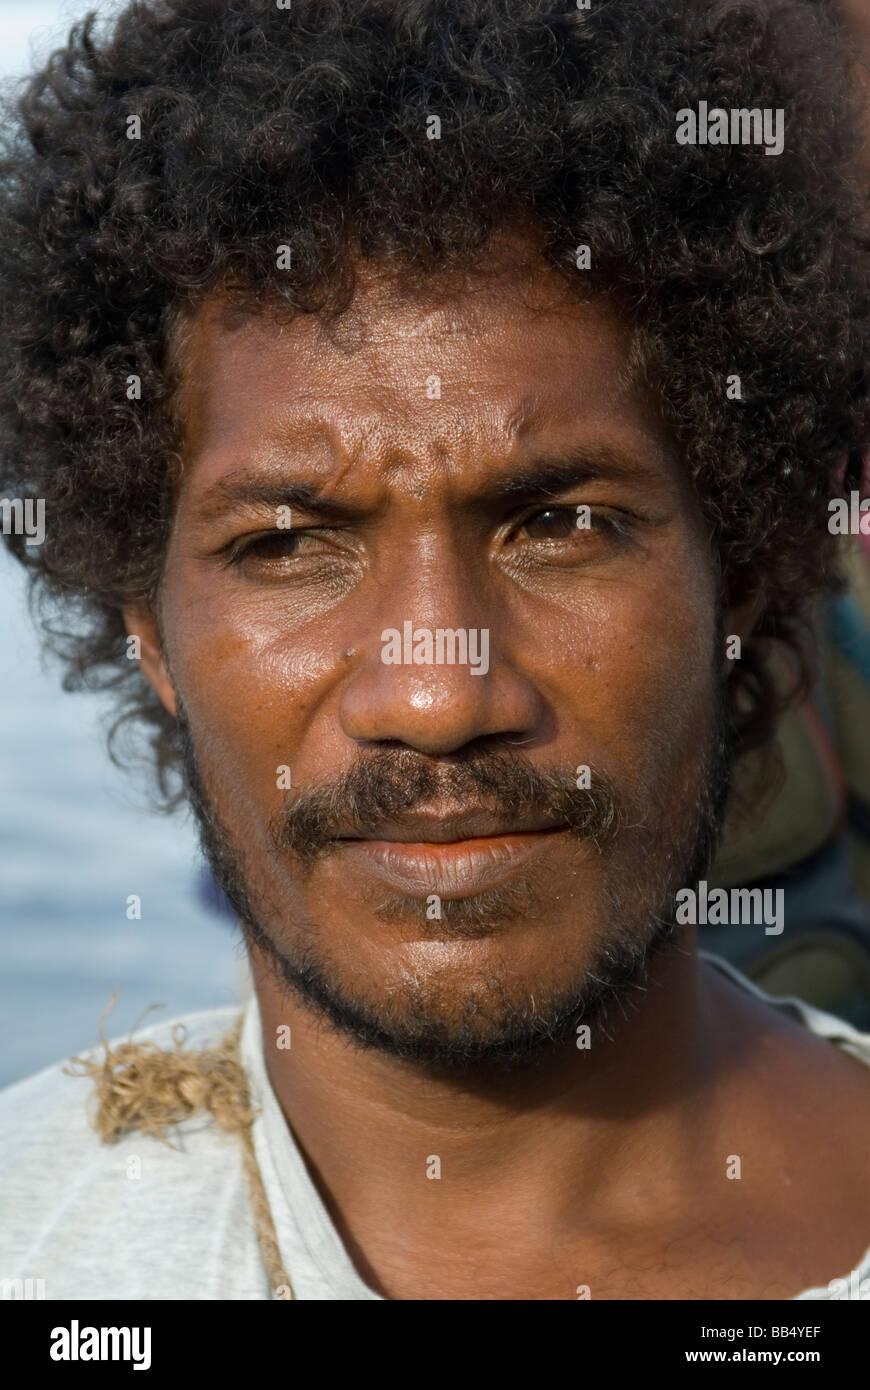 Solomon Islander in Honiara, Solomon Islands - Stock Image